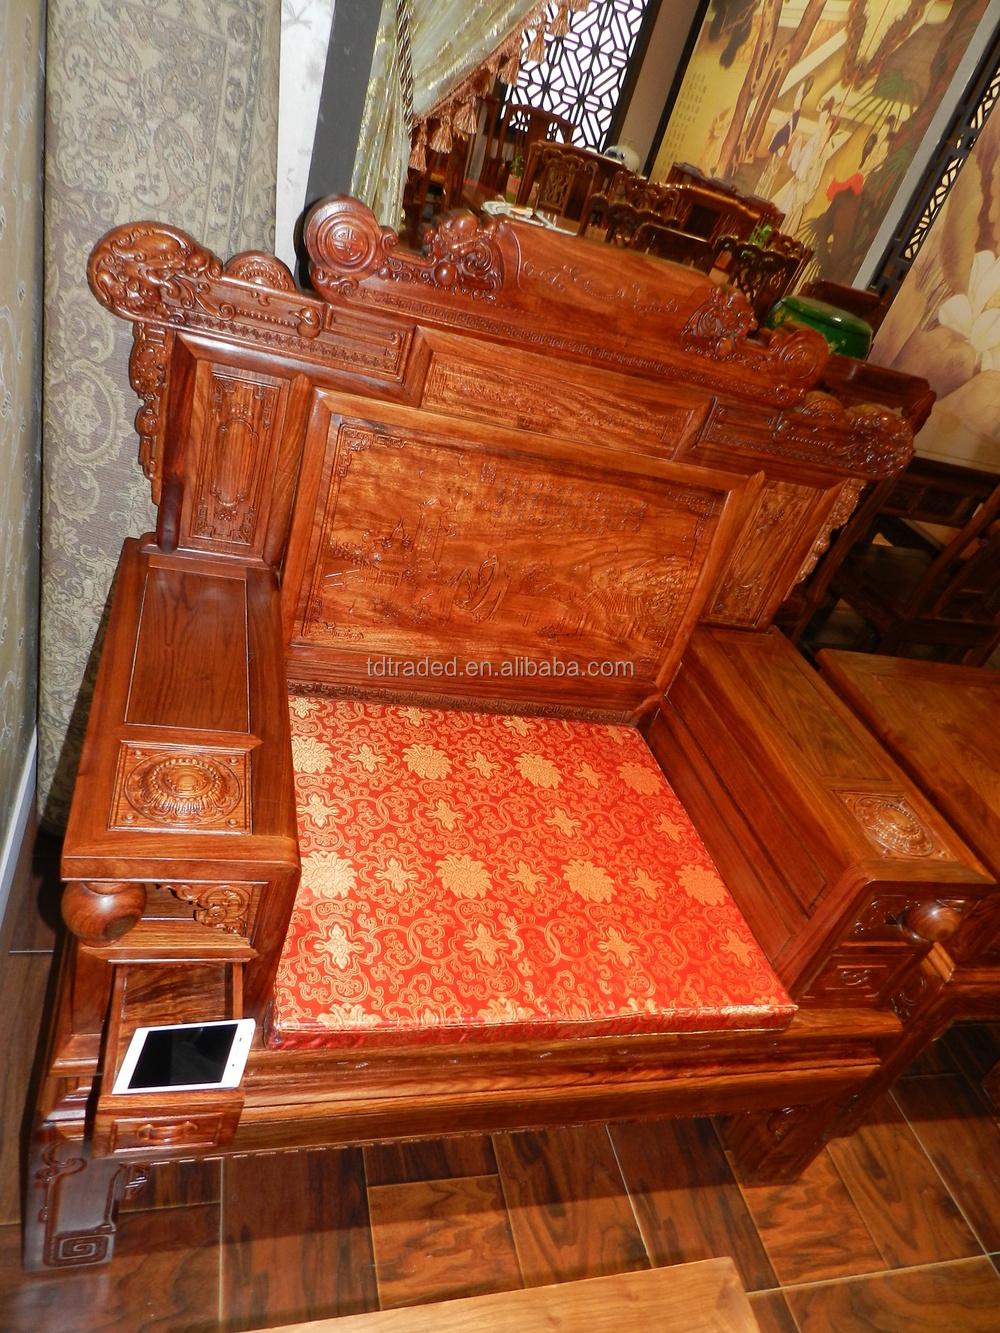 hoge kwaliteit rode houten meubelen-slaapkamer sets-product-ID ...